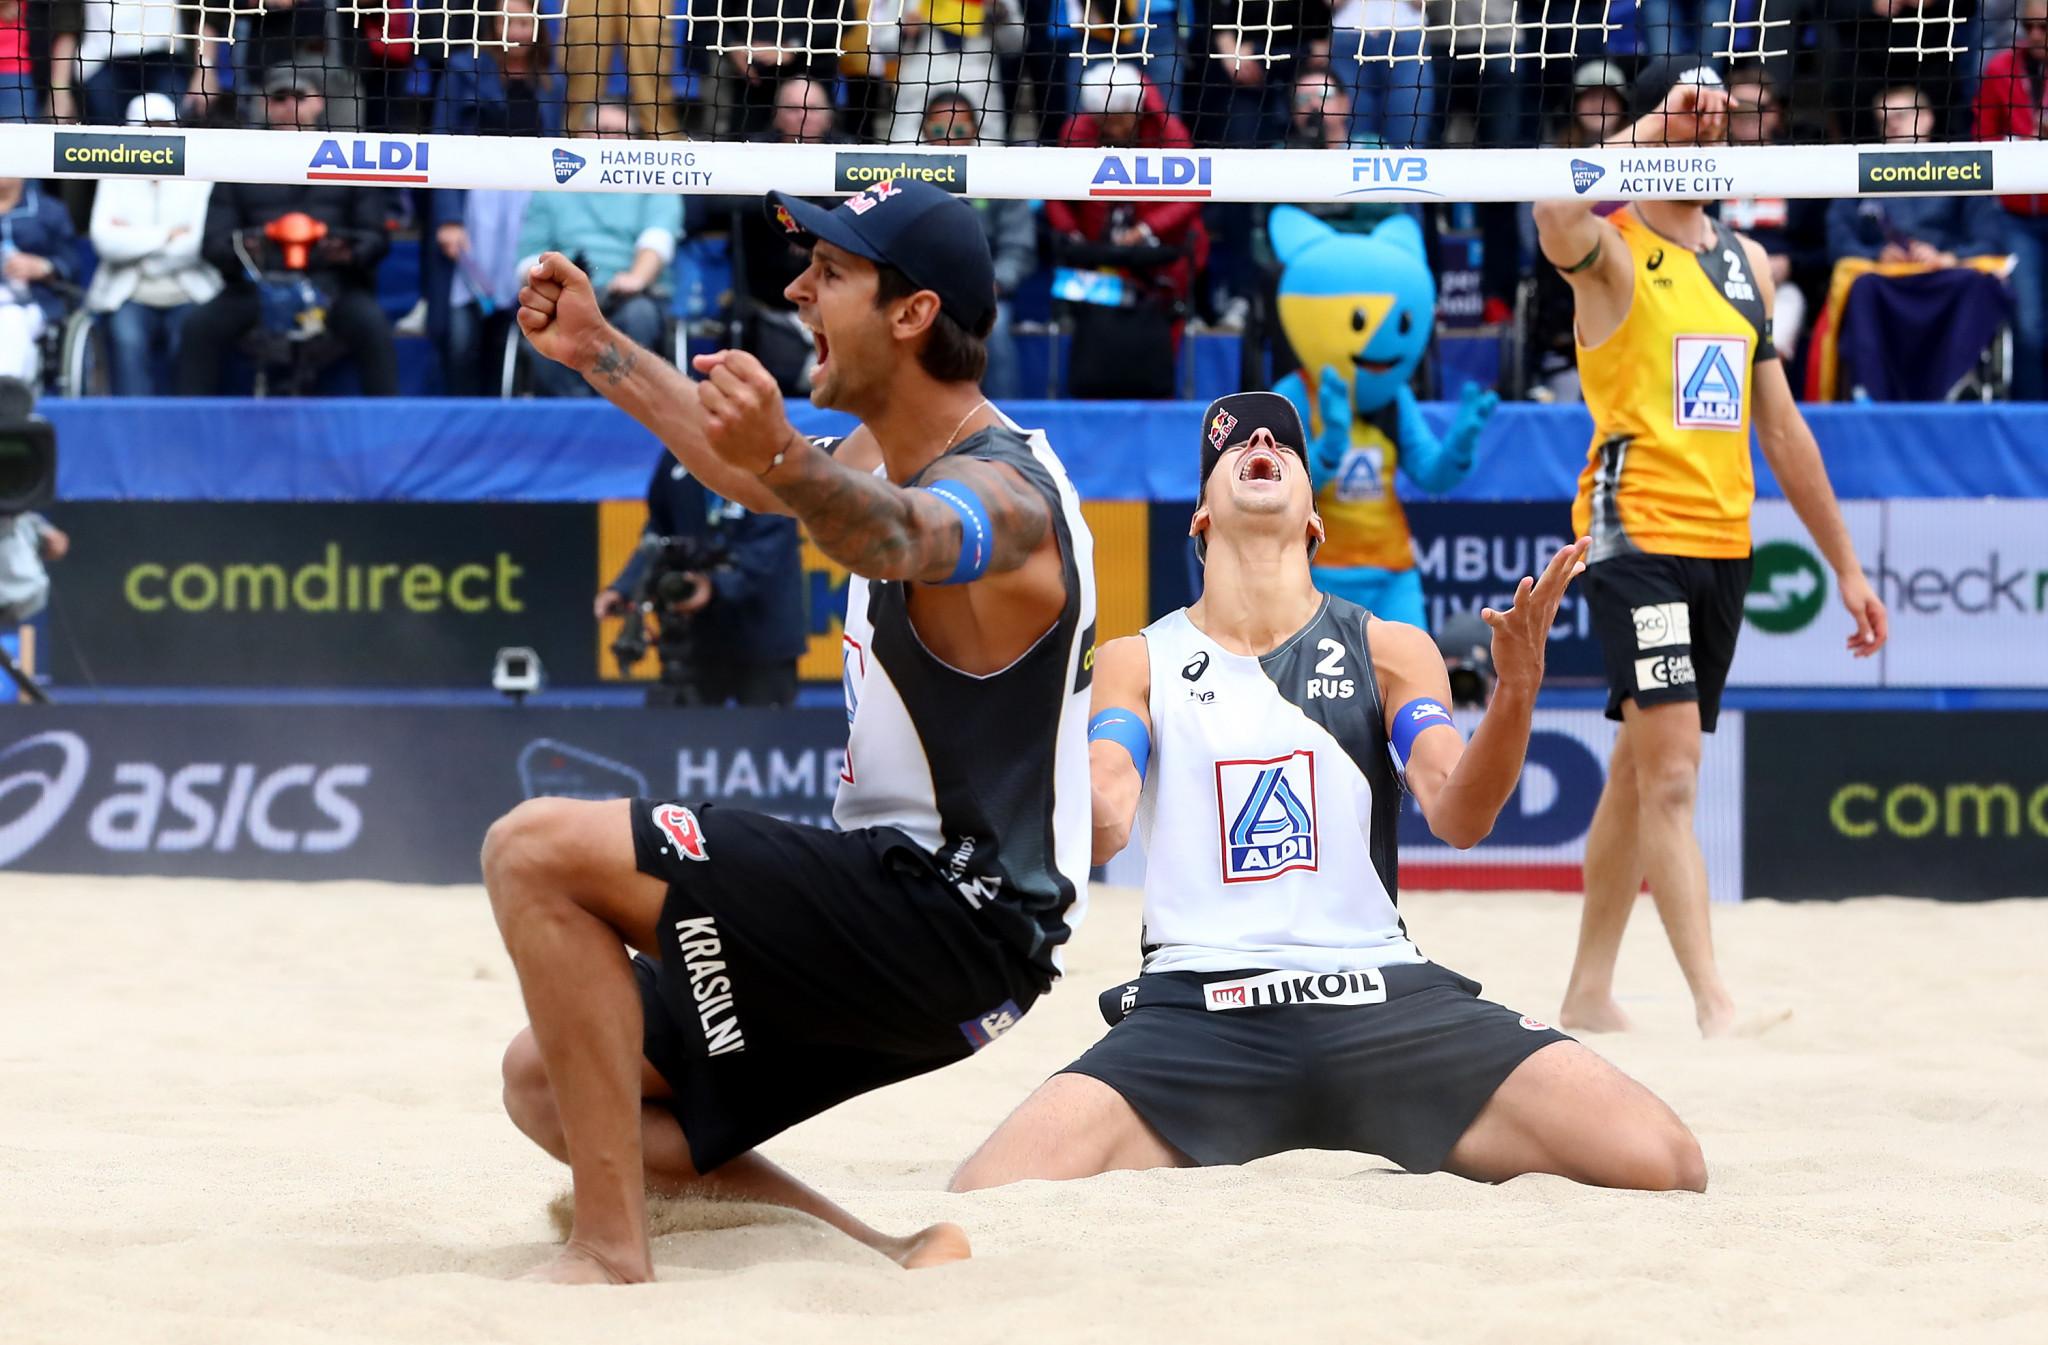 World champions Viacheslav Krasilnikov and Oleg Stoyanovskiy are the men's top seeds on home sand ©Getty Images